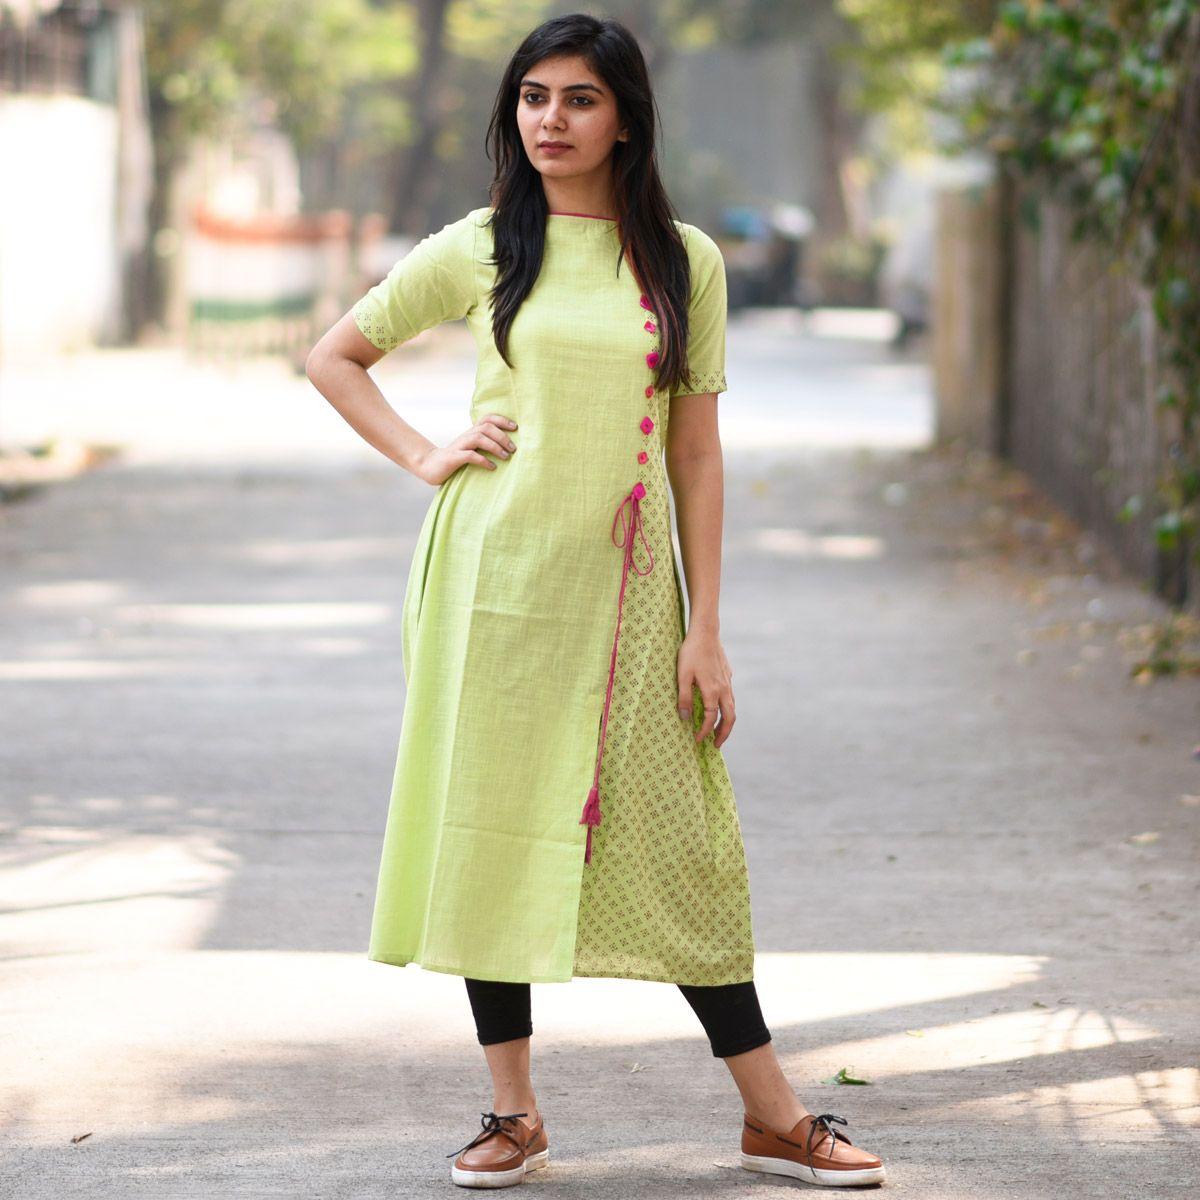 4ae10ec4be Ways to style Indian regular kurta, lemon kurta with side slit. Gujarati  style kurta paired with leggings and brown moccasins.